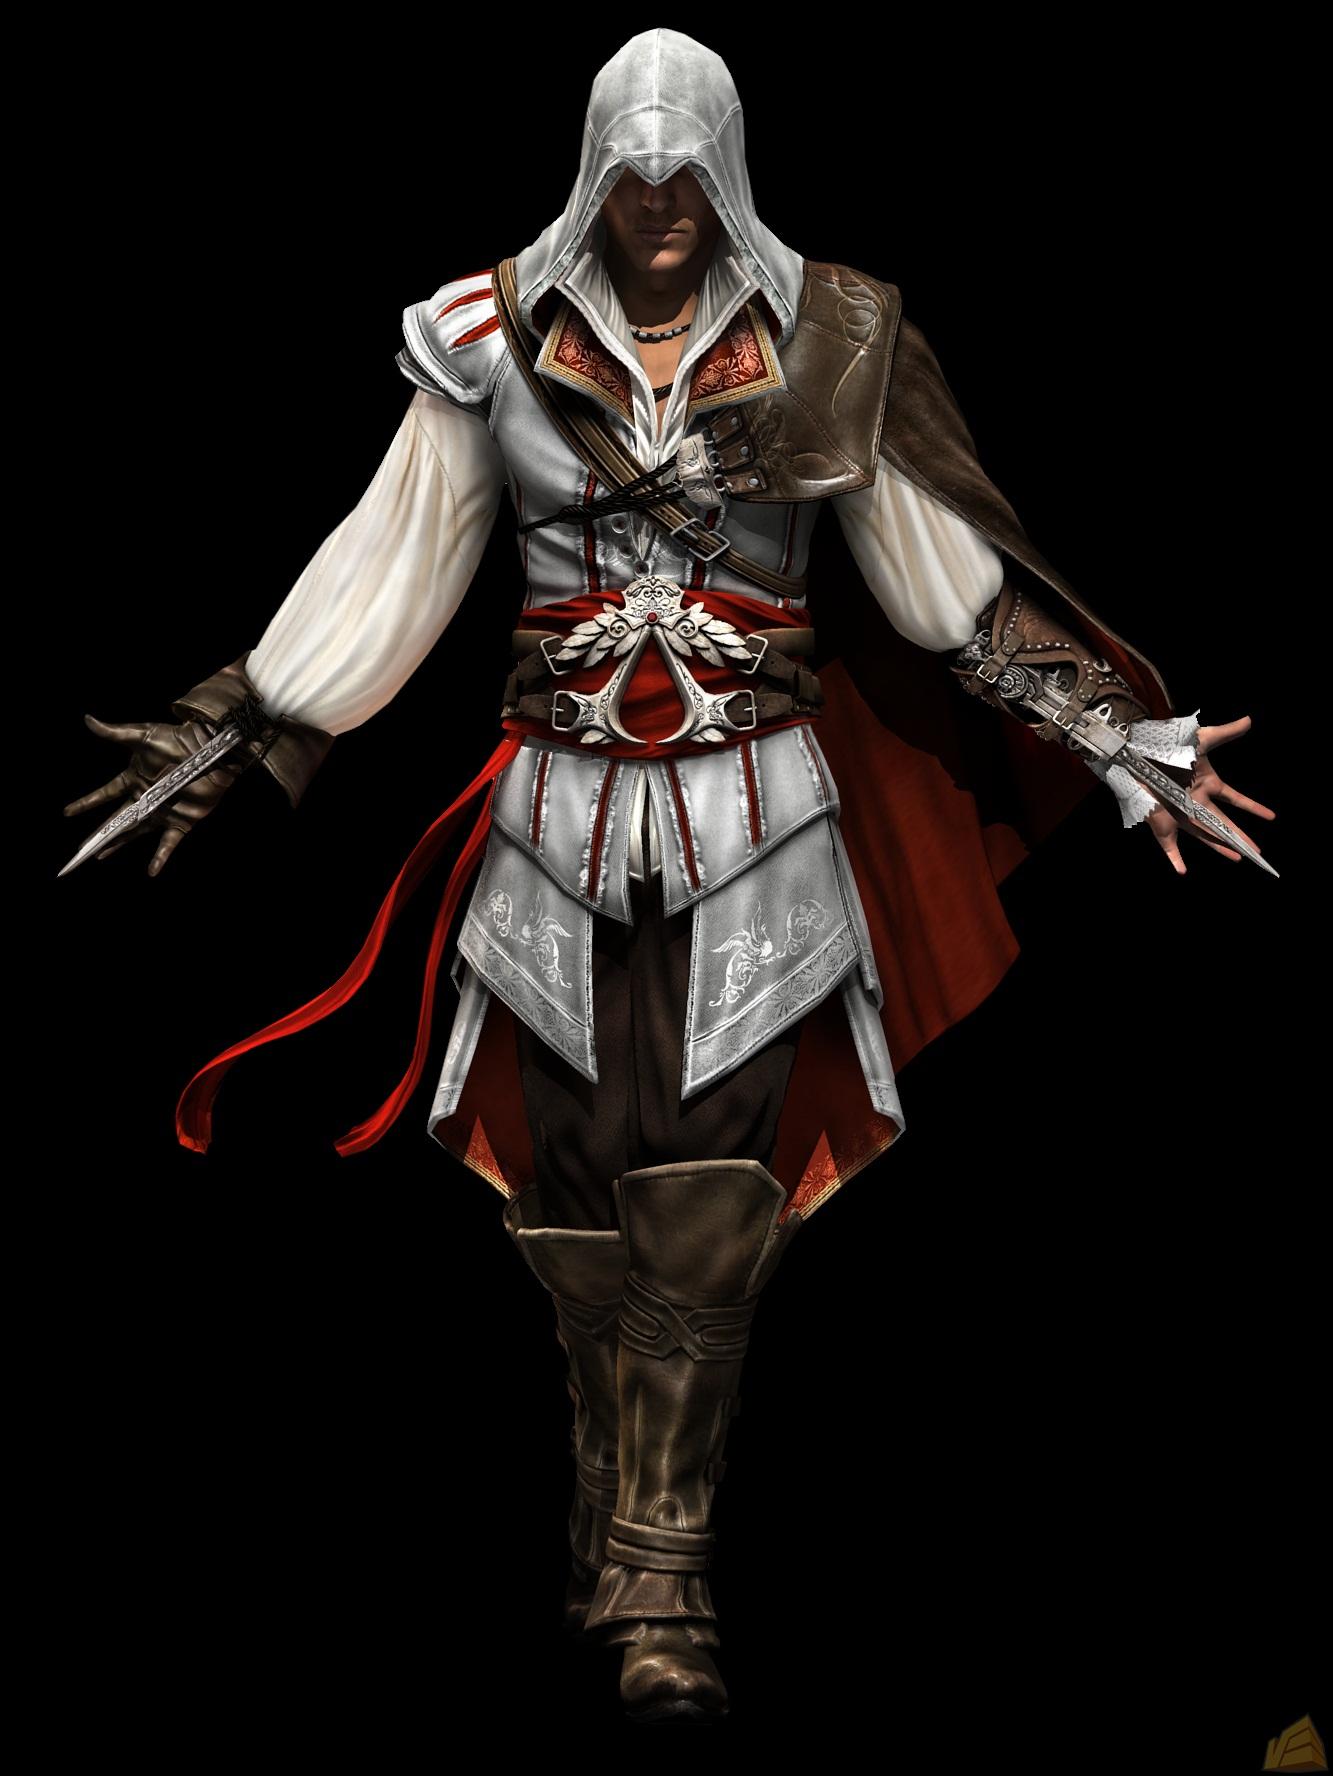 Ezio Costume For Kids